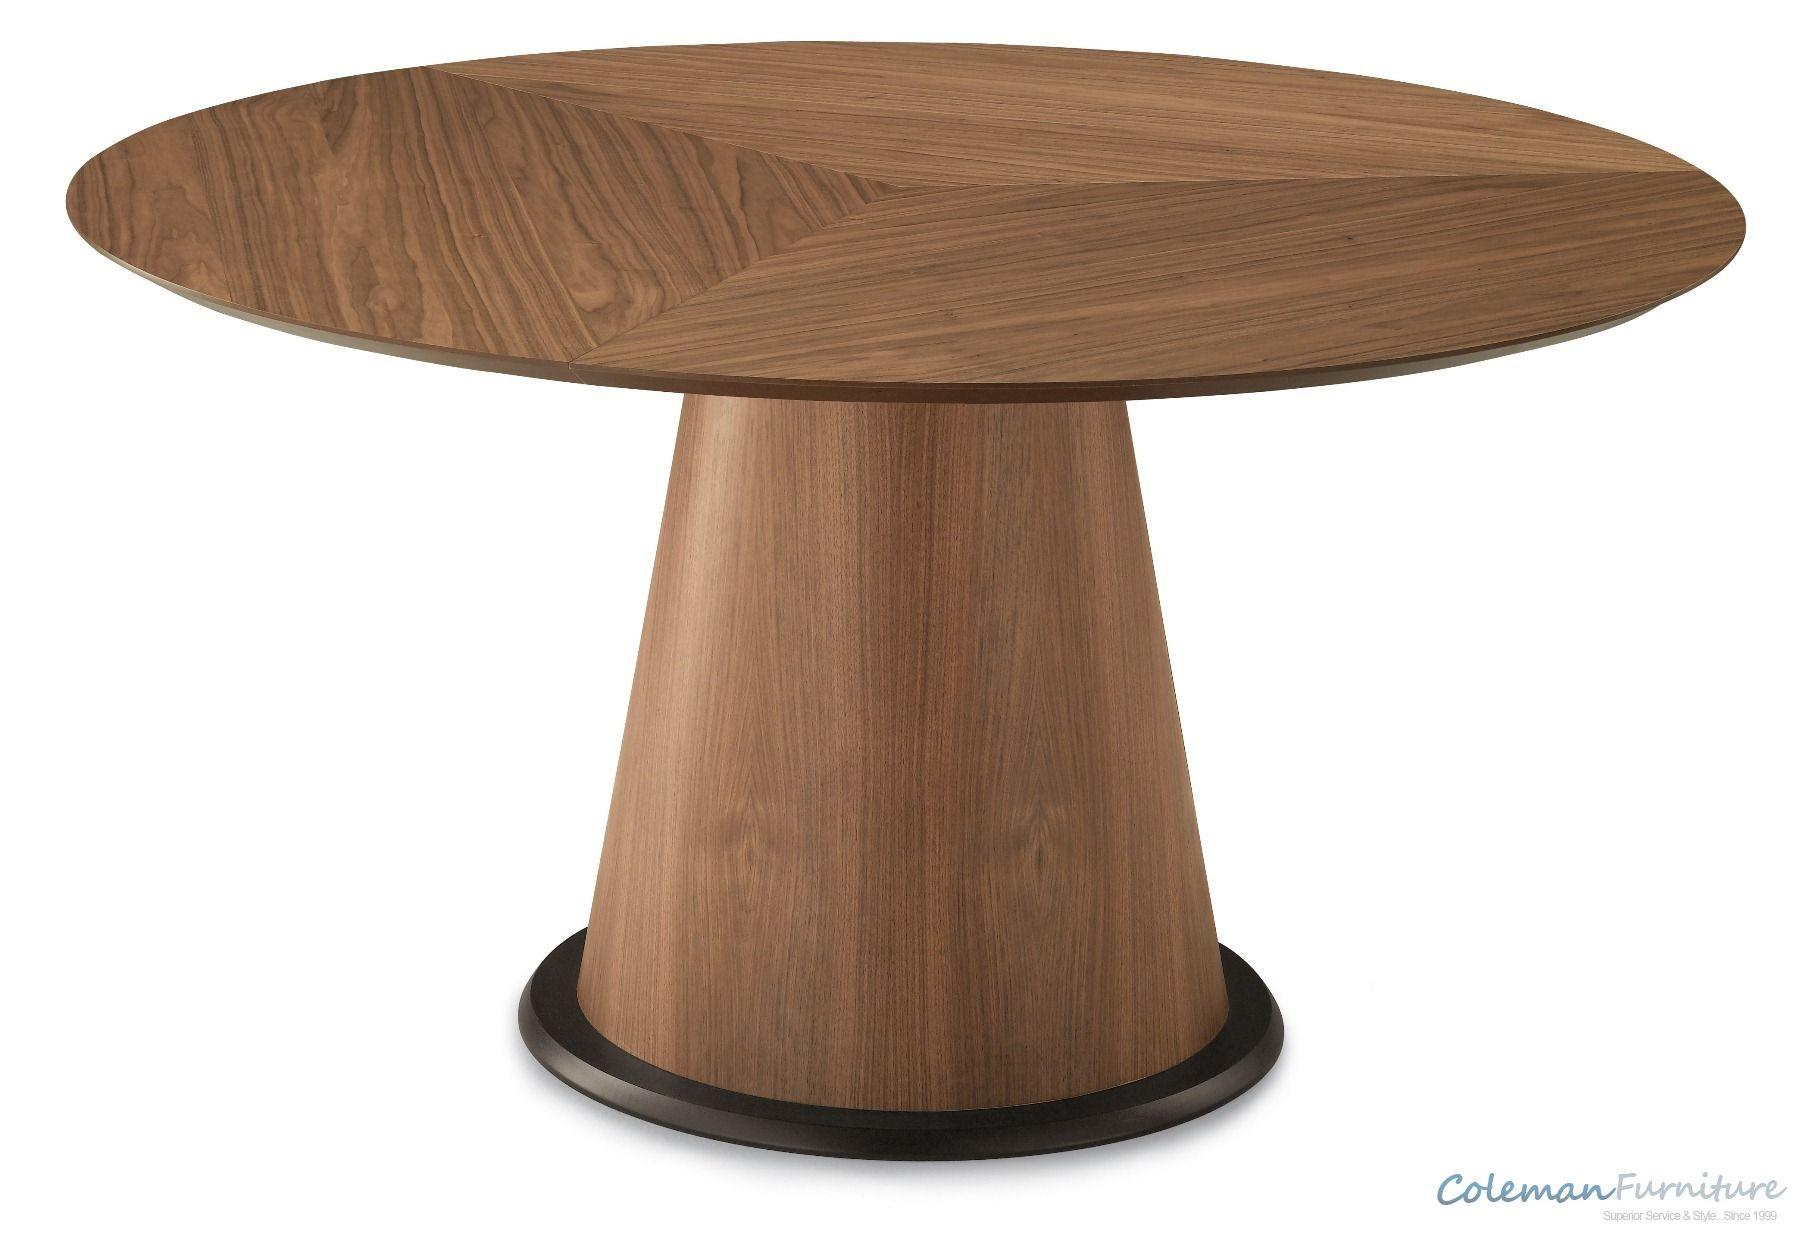 Palio Walnut 60 Inch Round Table From Domitalia Palio T